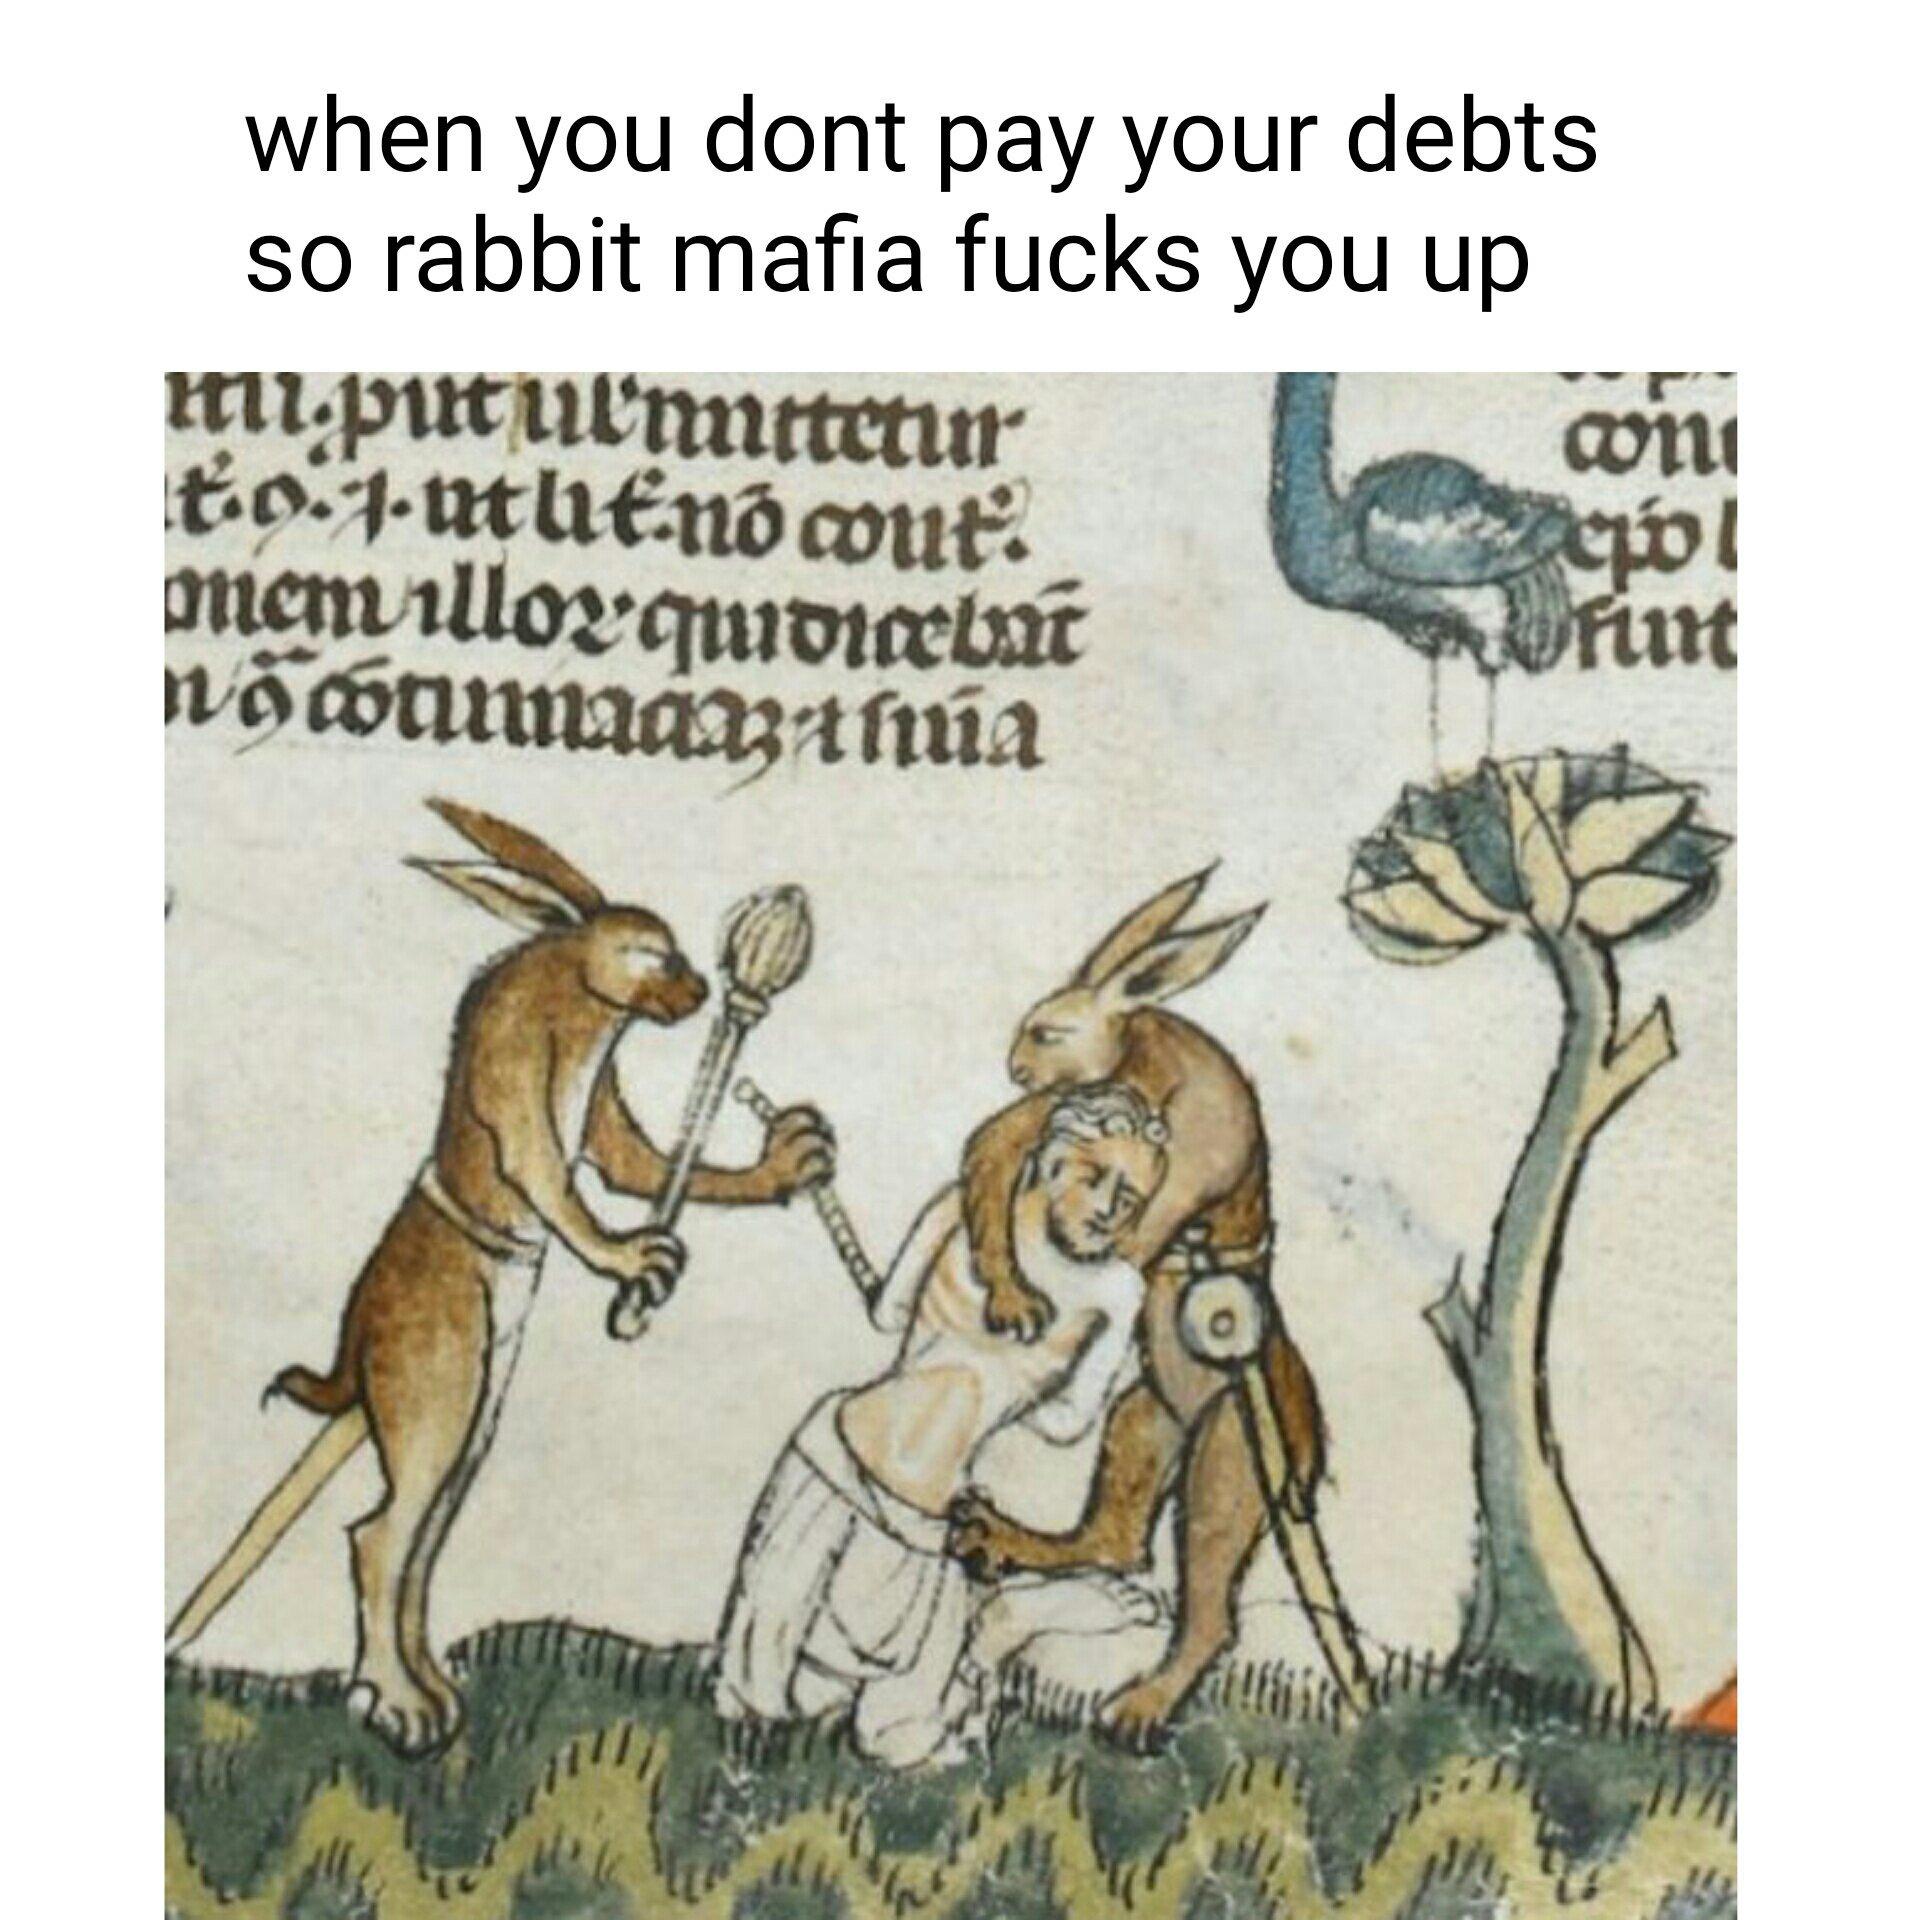 I cri evrytim - meme